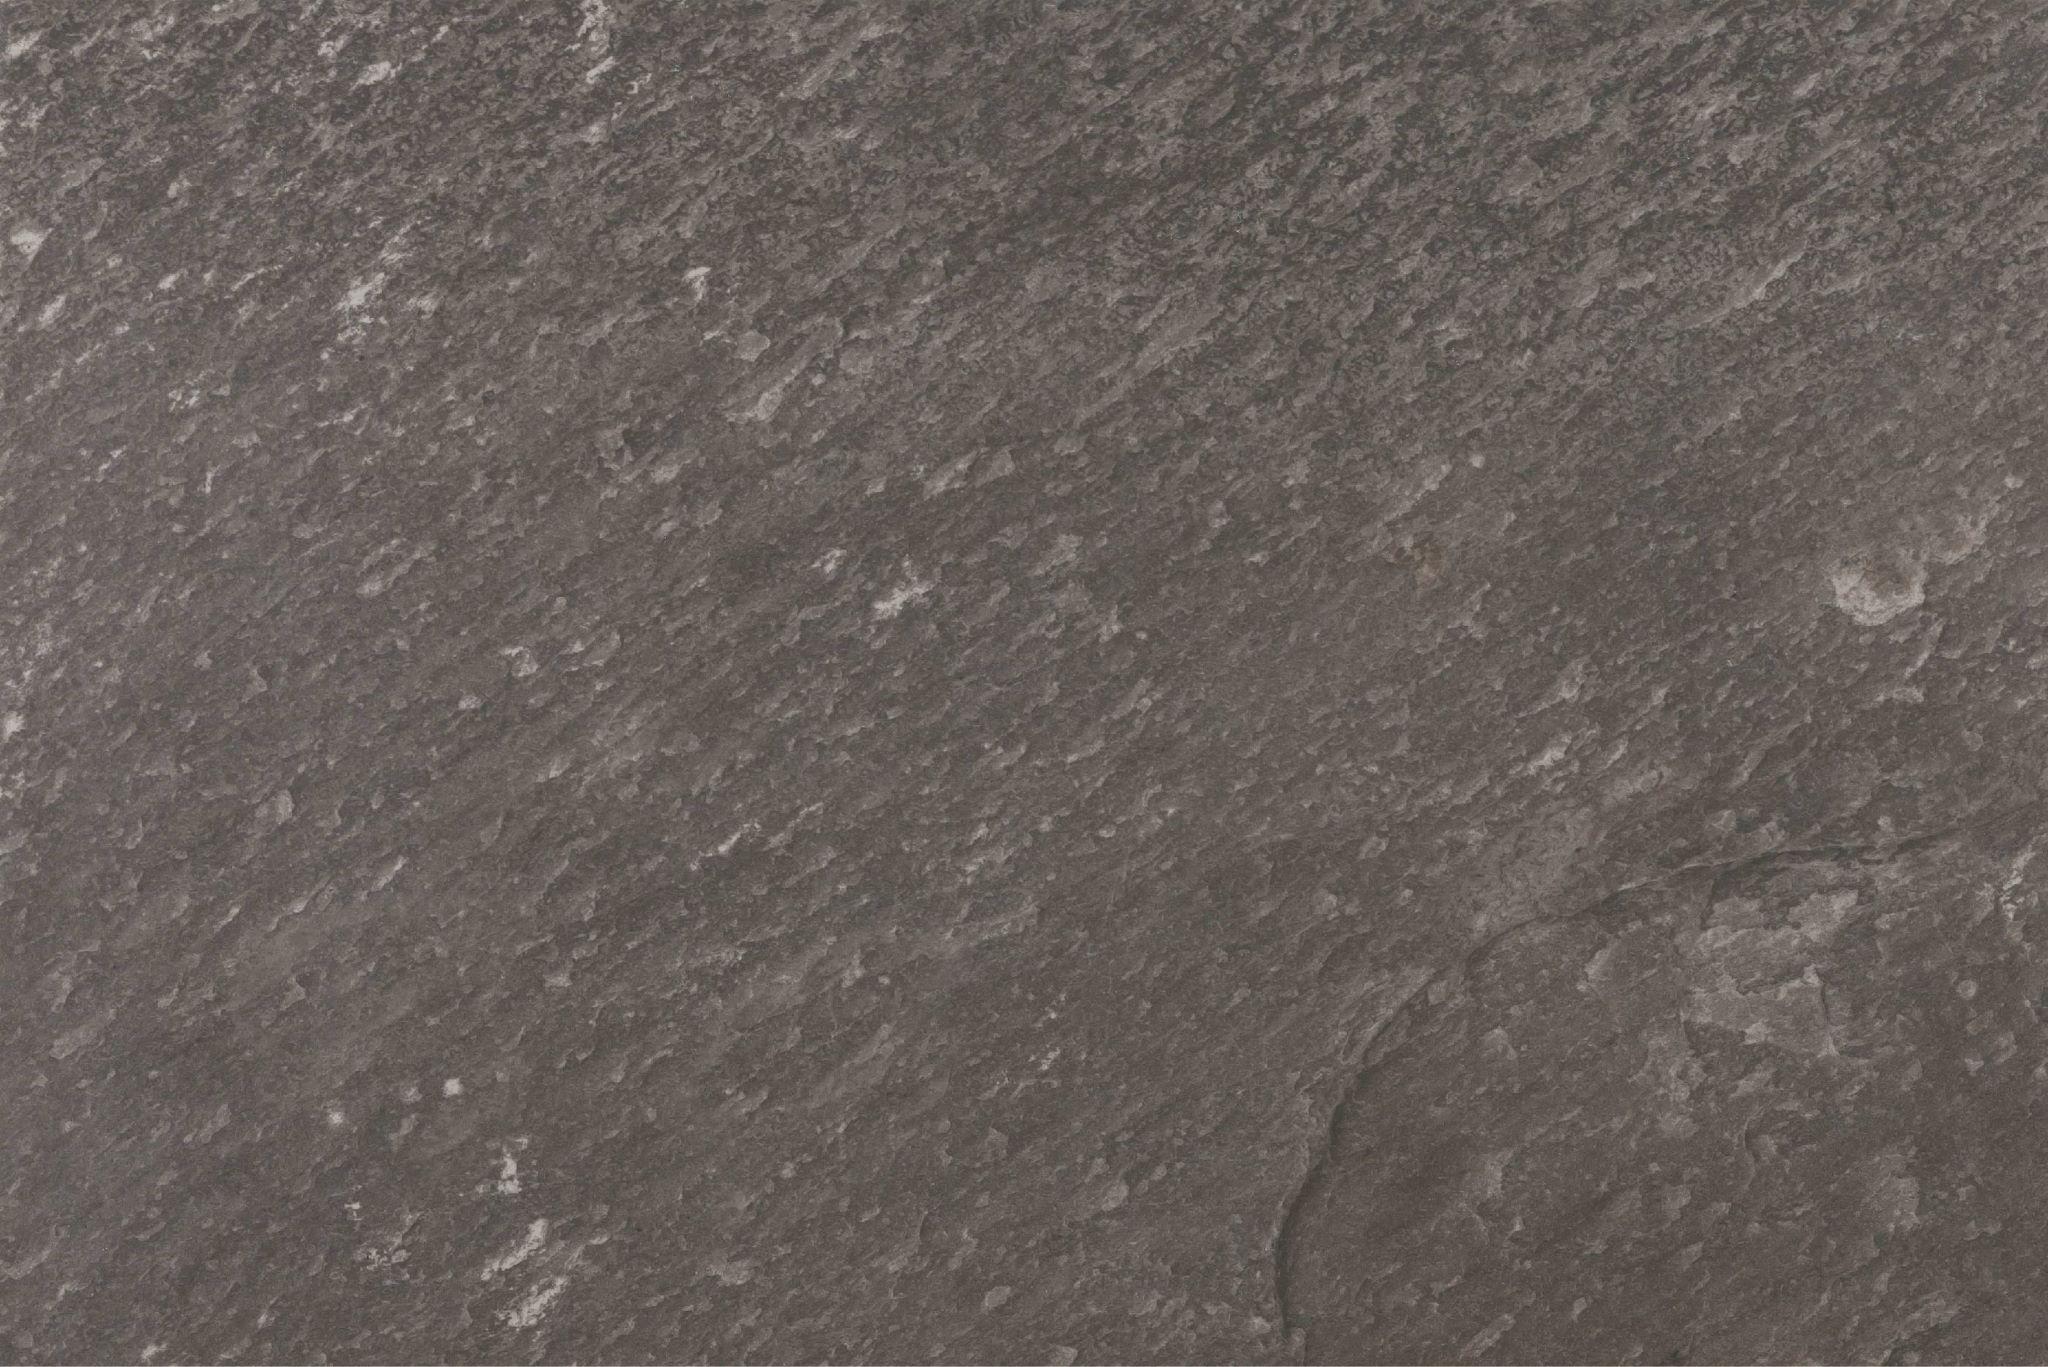 carrelage azuliber s rie nistos 40x60 1 choix carrelage. Black Bedroom Furniture Sets. Home Design Ideas